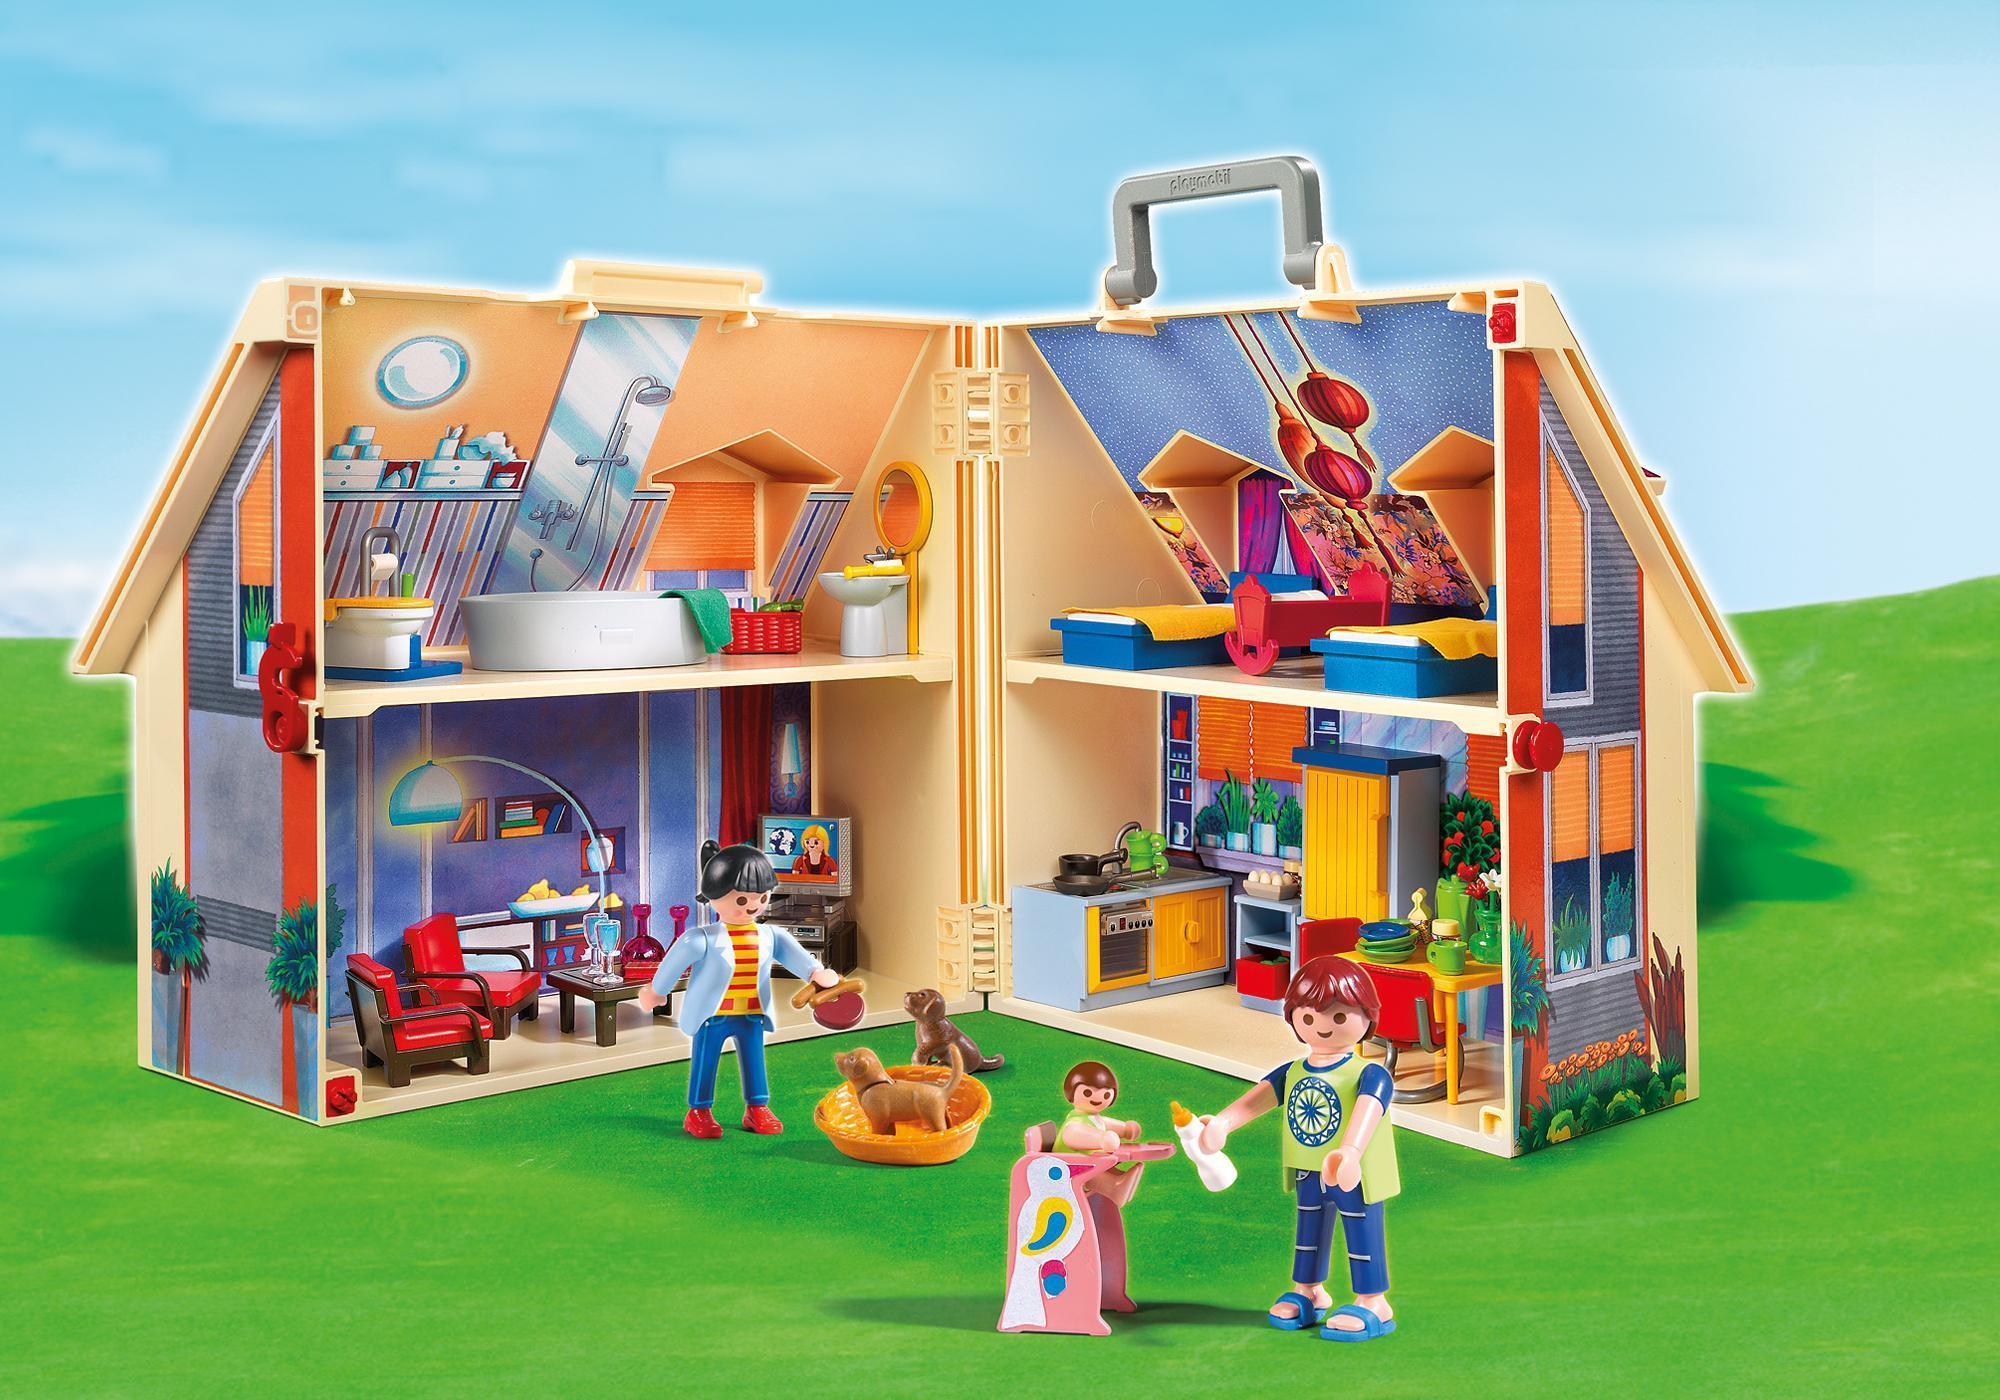 http://media.playmobil.com/i/playmobil/5167_product_detail/Mijn meeneempoppenhuis